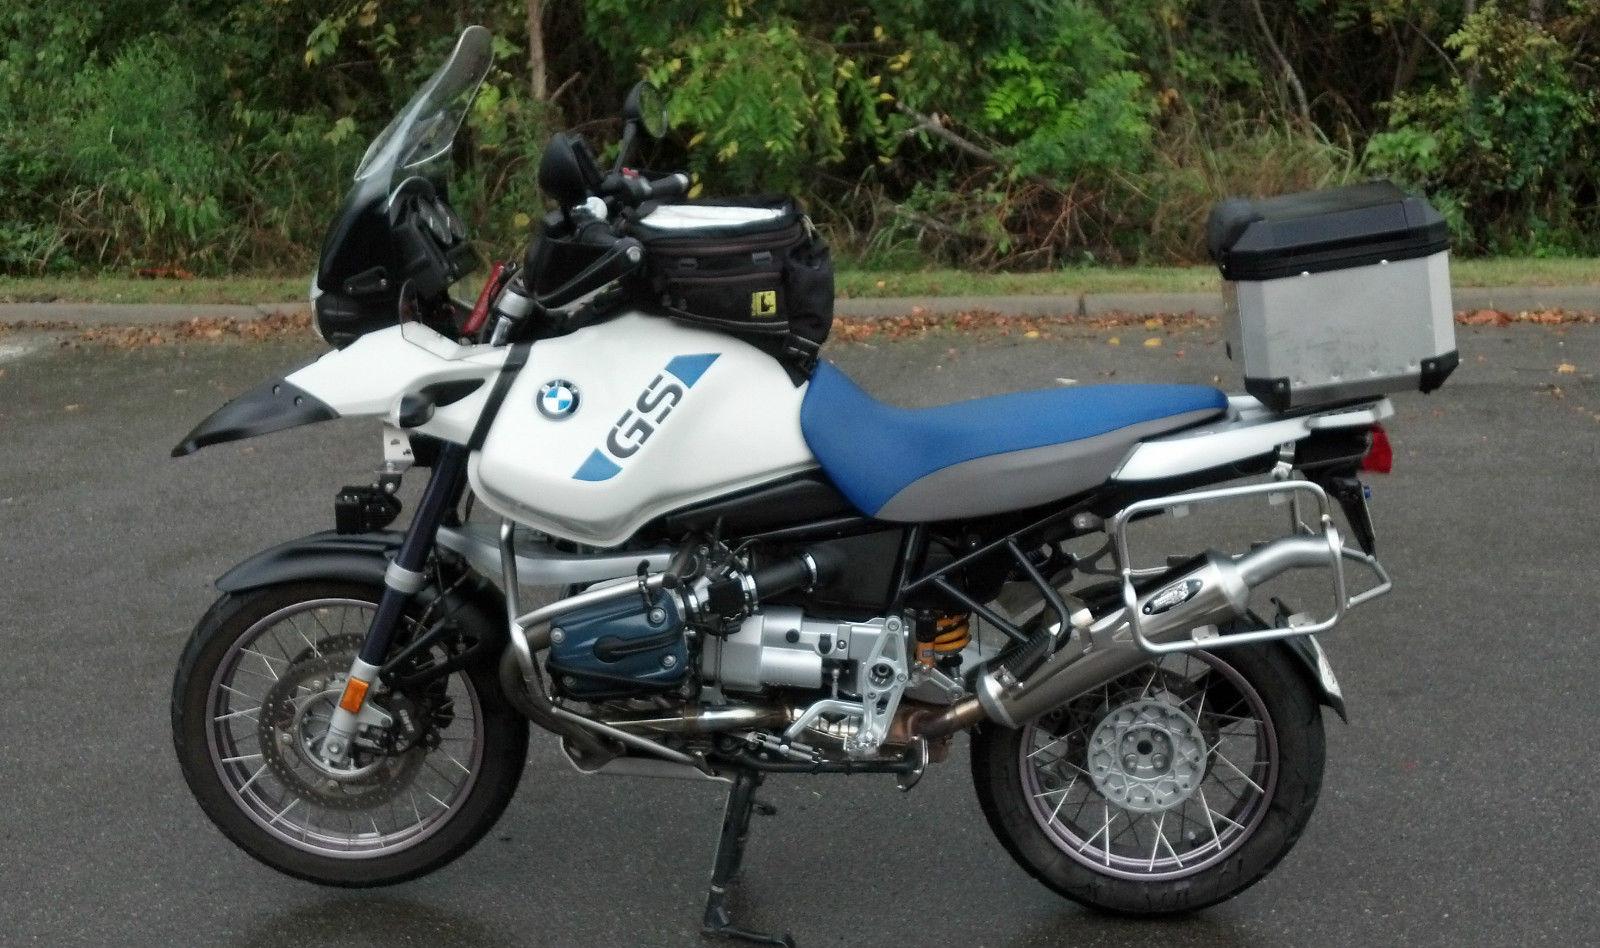 2006 bmw r1150gs adv dual sport adventure rider r1150 gsa. Black Bedroom Furniture Sets. Home Design Ideas